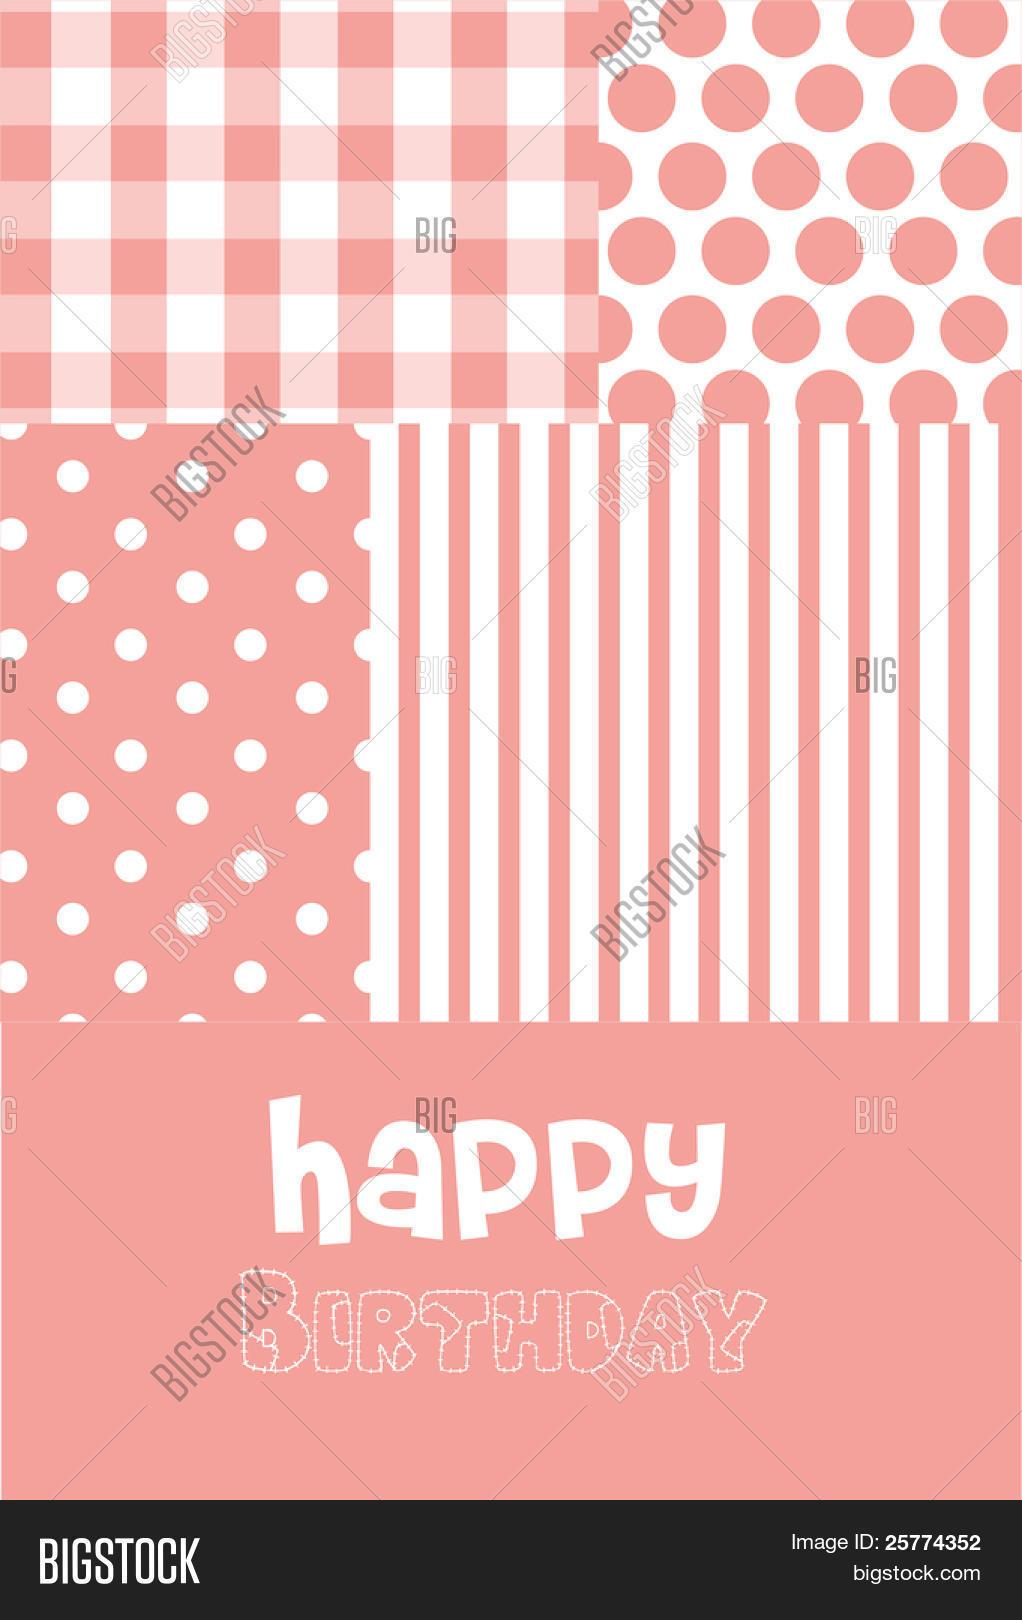 Baby girl birth vector photo free trial bigstock baby girl birth announcement or birthday greeting card m4hsunfo